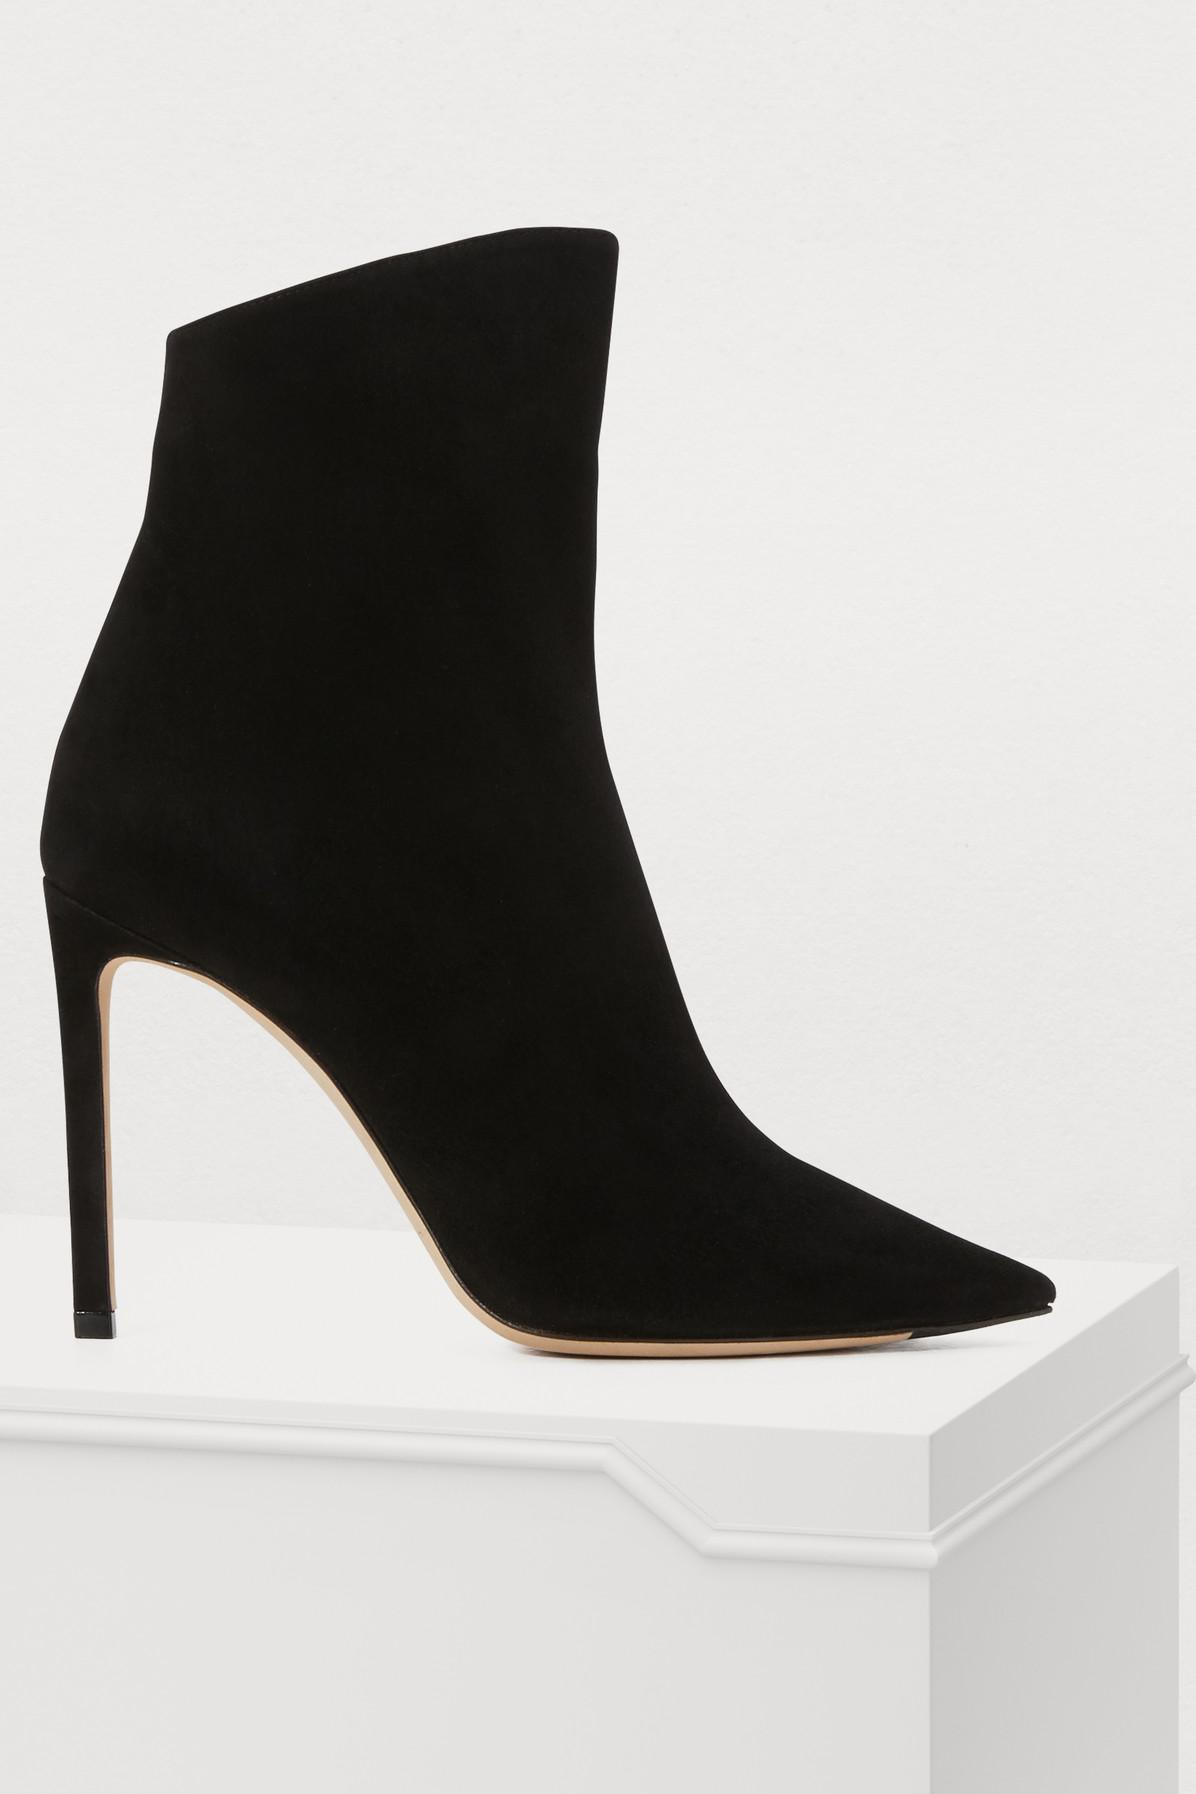 751aeaba5576 Lyst - Jimmy Choo Helaine 100 Ankle Boots in Black